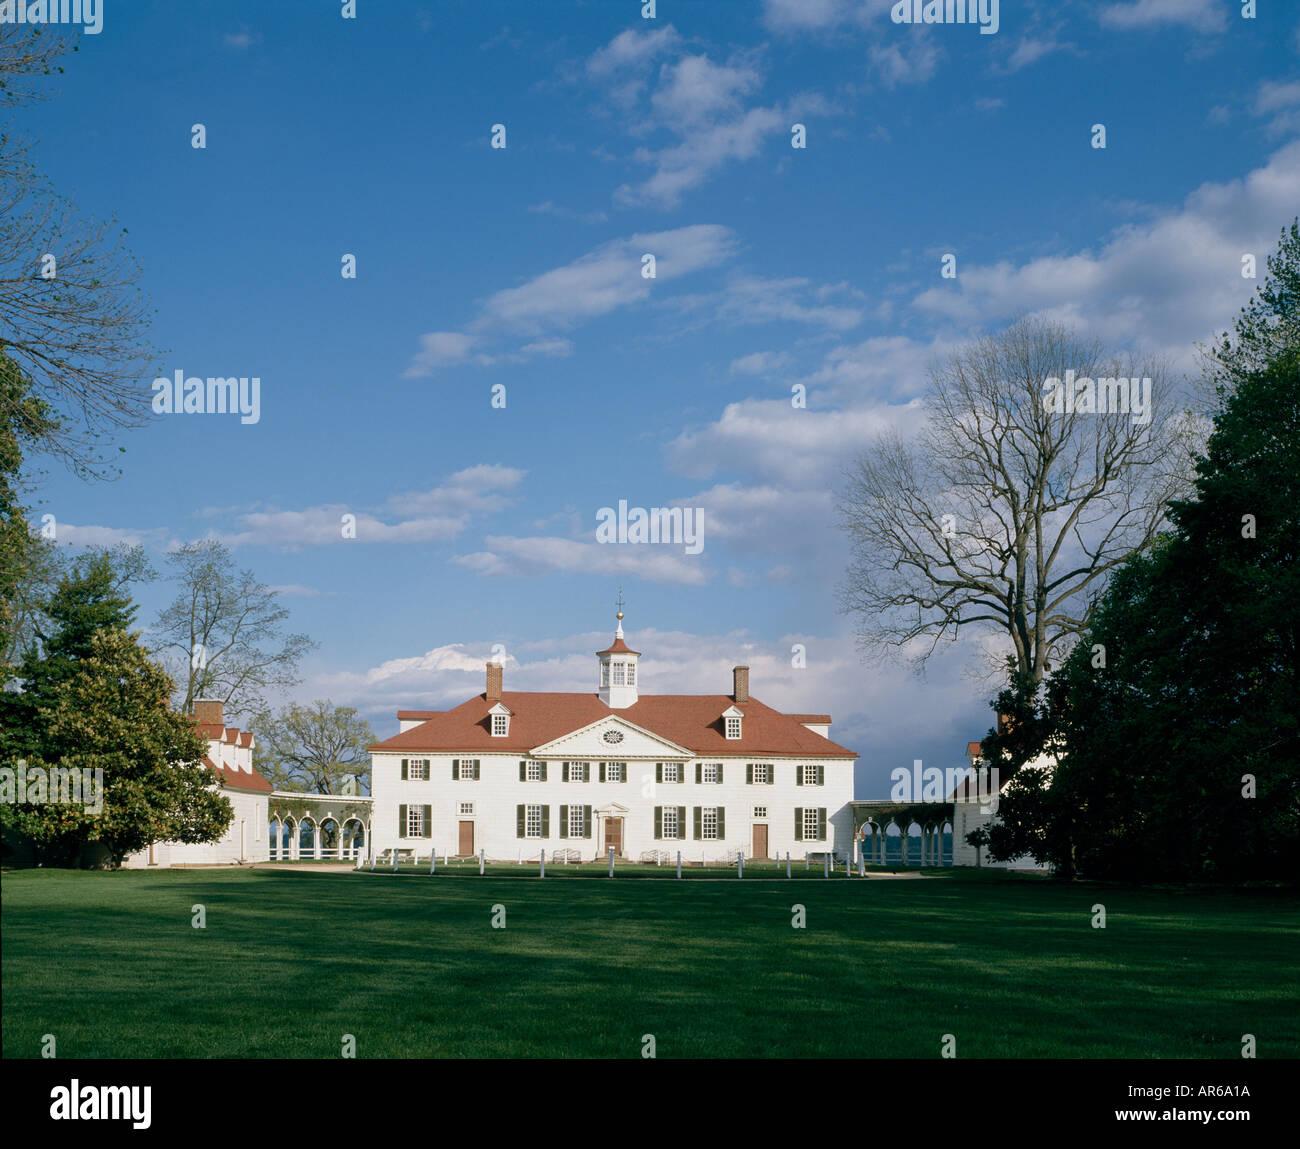 Mount Vernon, Virginia, 1760 - 1787. Home of George Washington. Overall exterior. Architect: George Washington - Stock Image